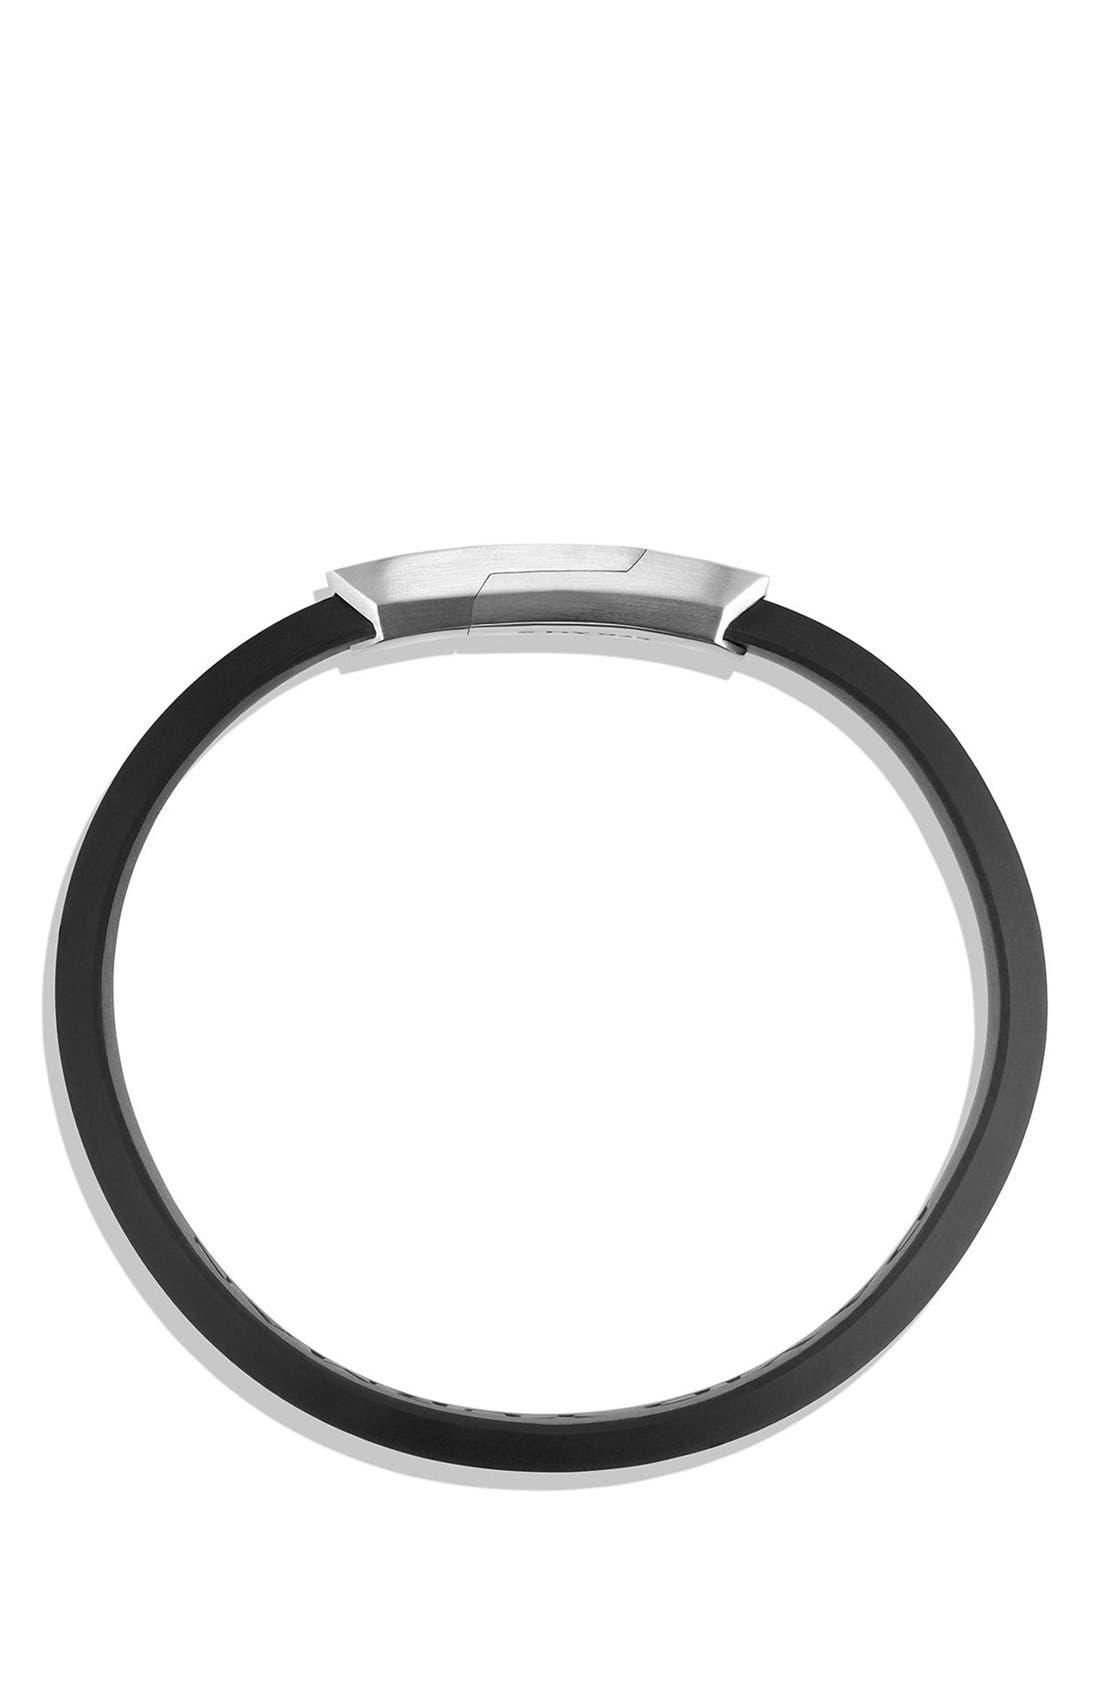 Alternate Image 2  - David Yurman 'Forged Carbon' Rubber ID Bracelet in Black